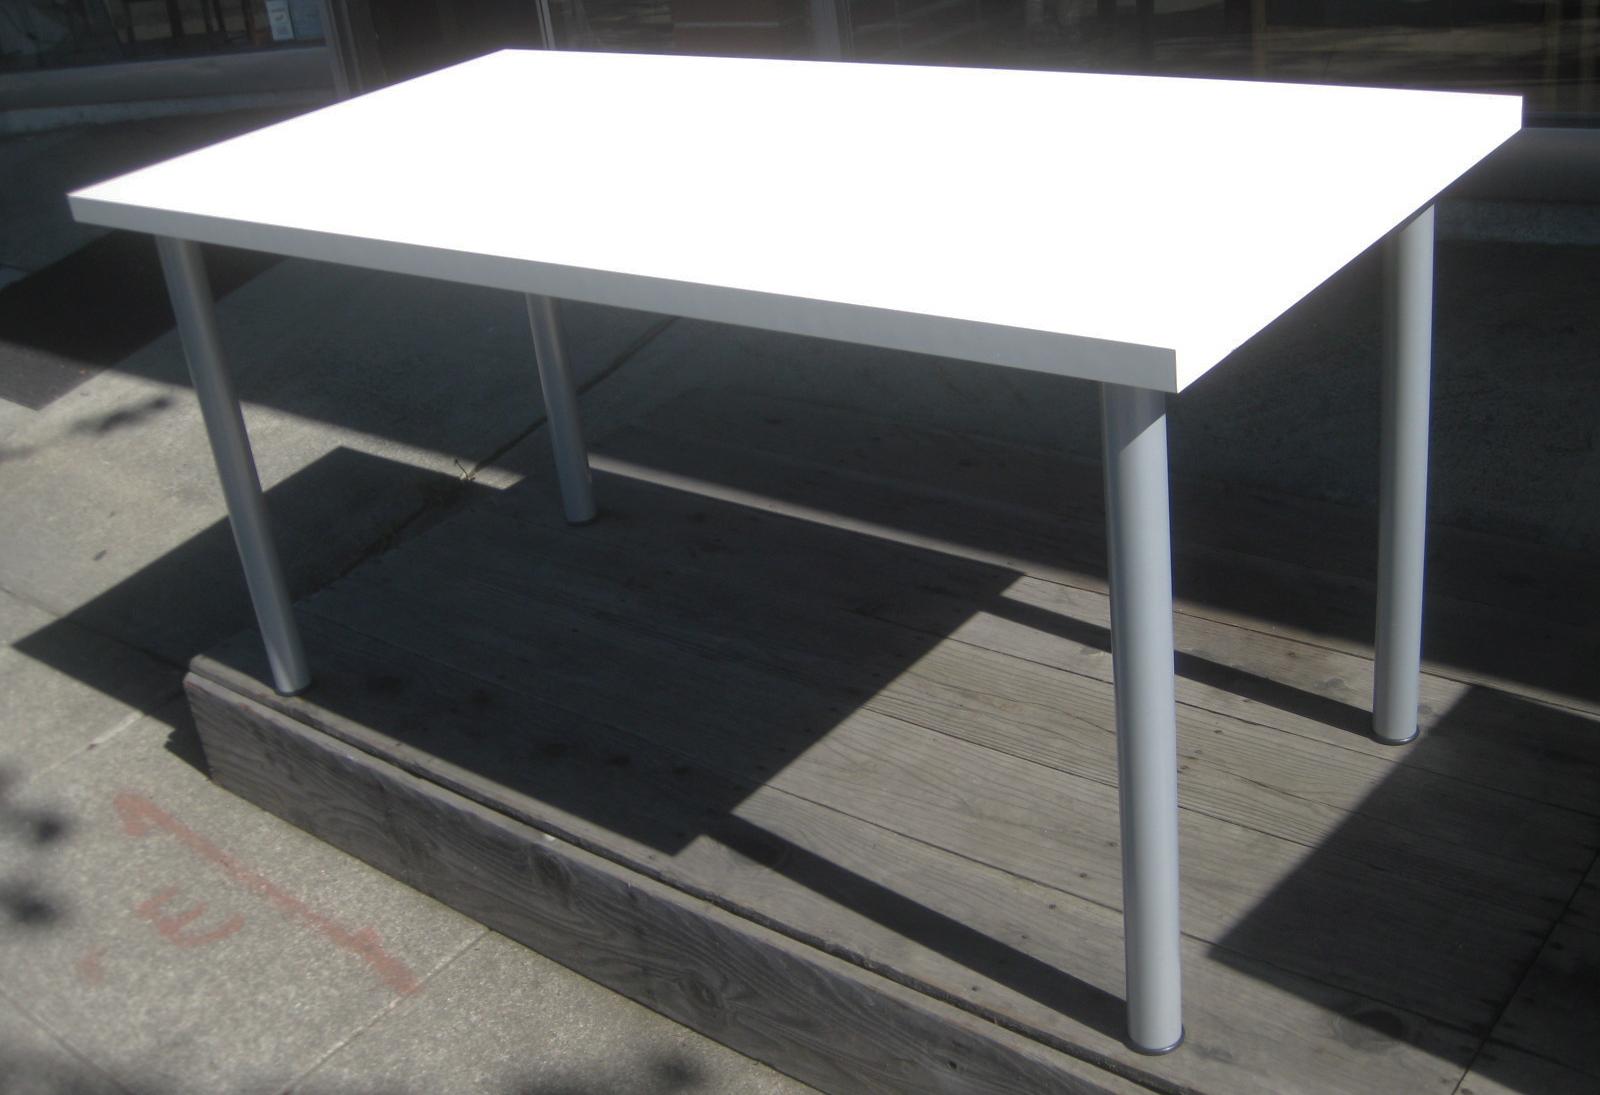 Uhuru furniture collectibles sold light duty ikea for Table lit ordinateur ikea